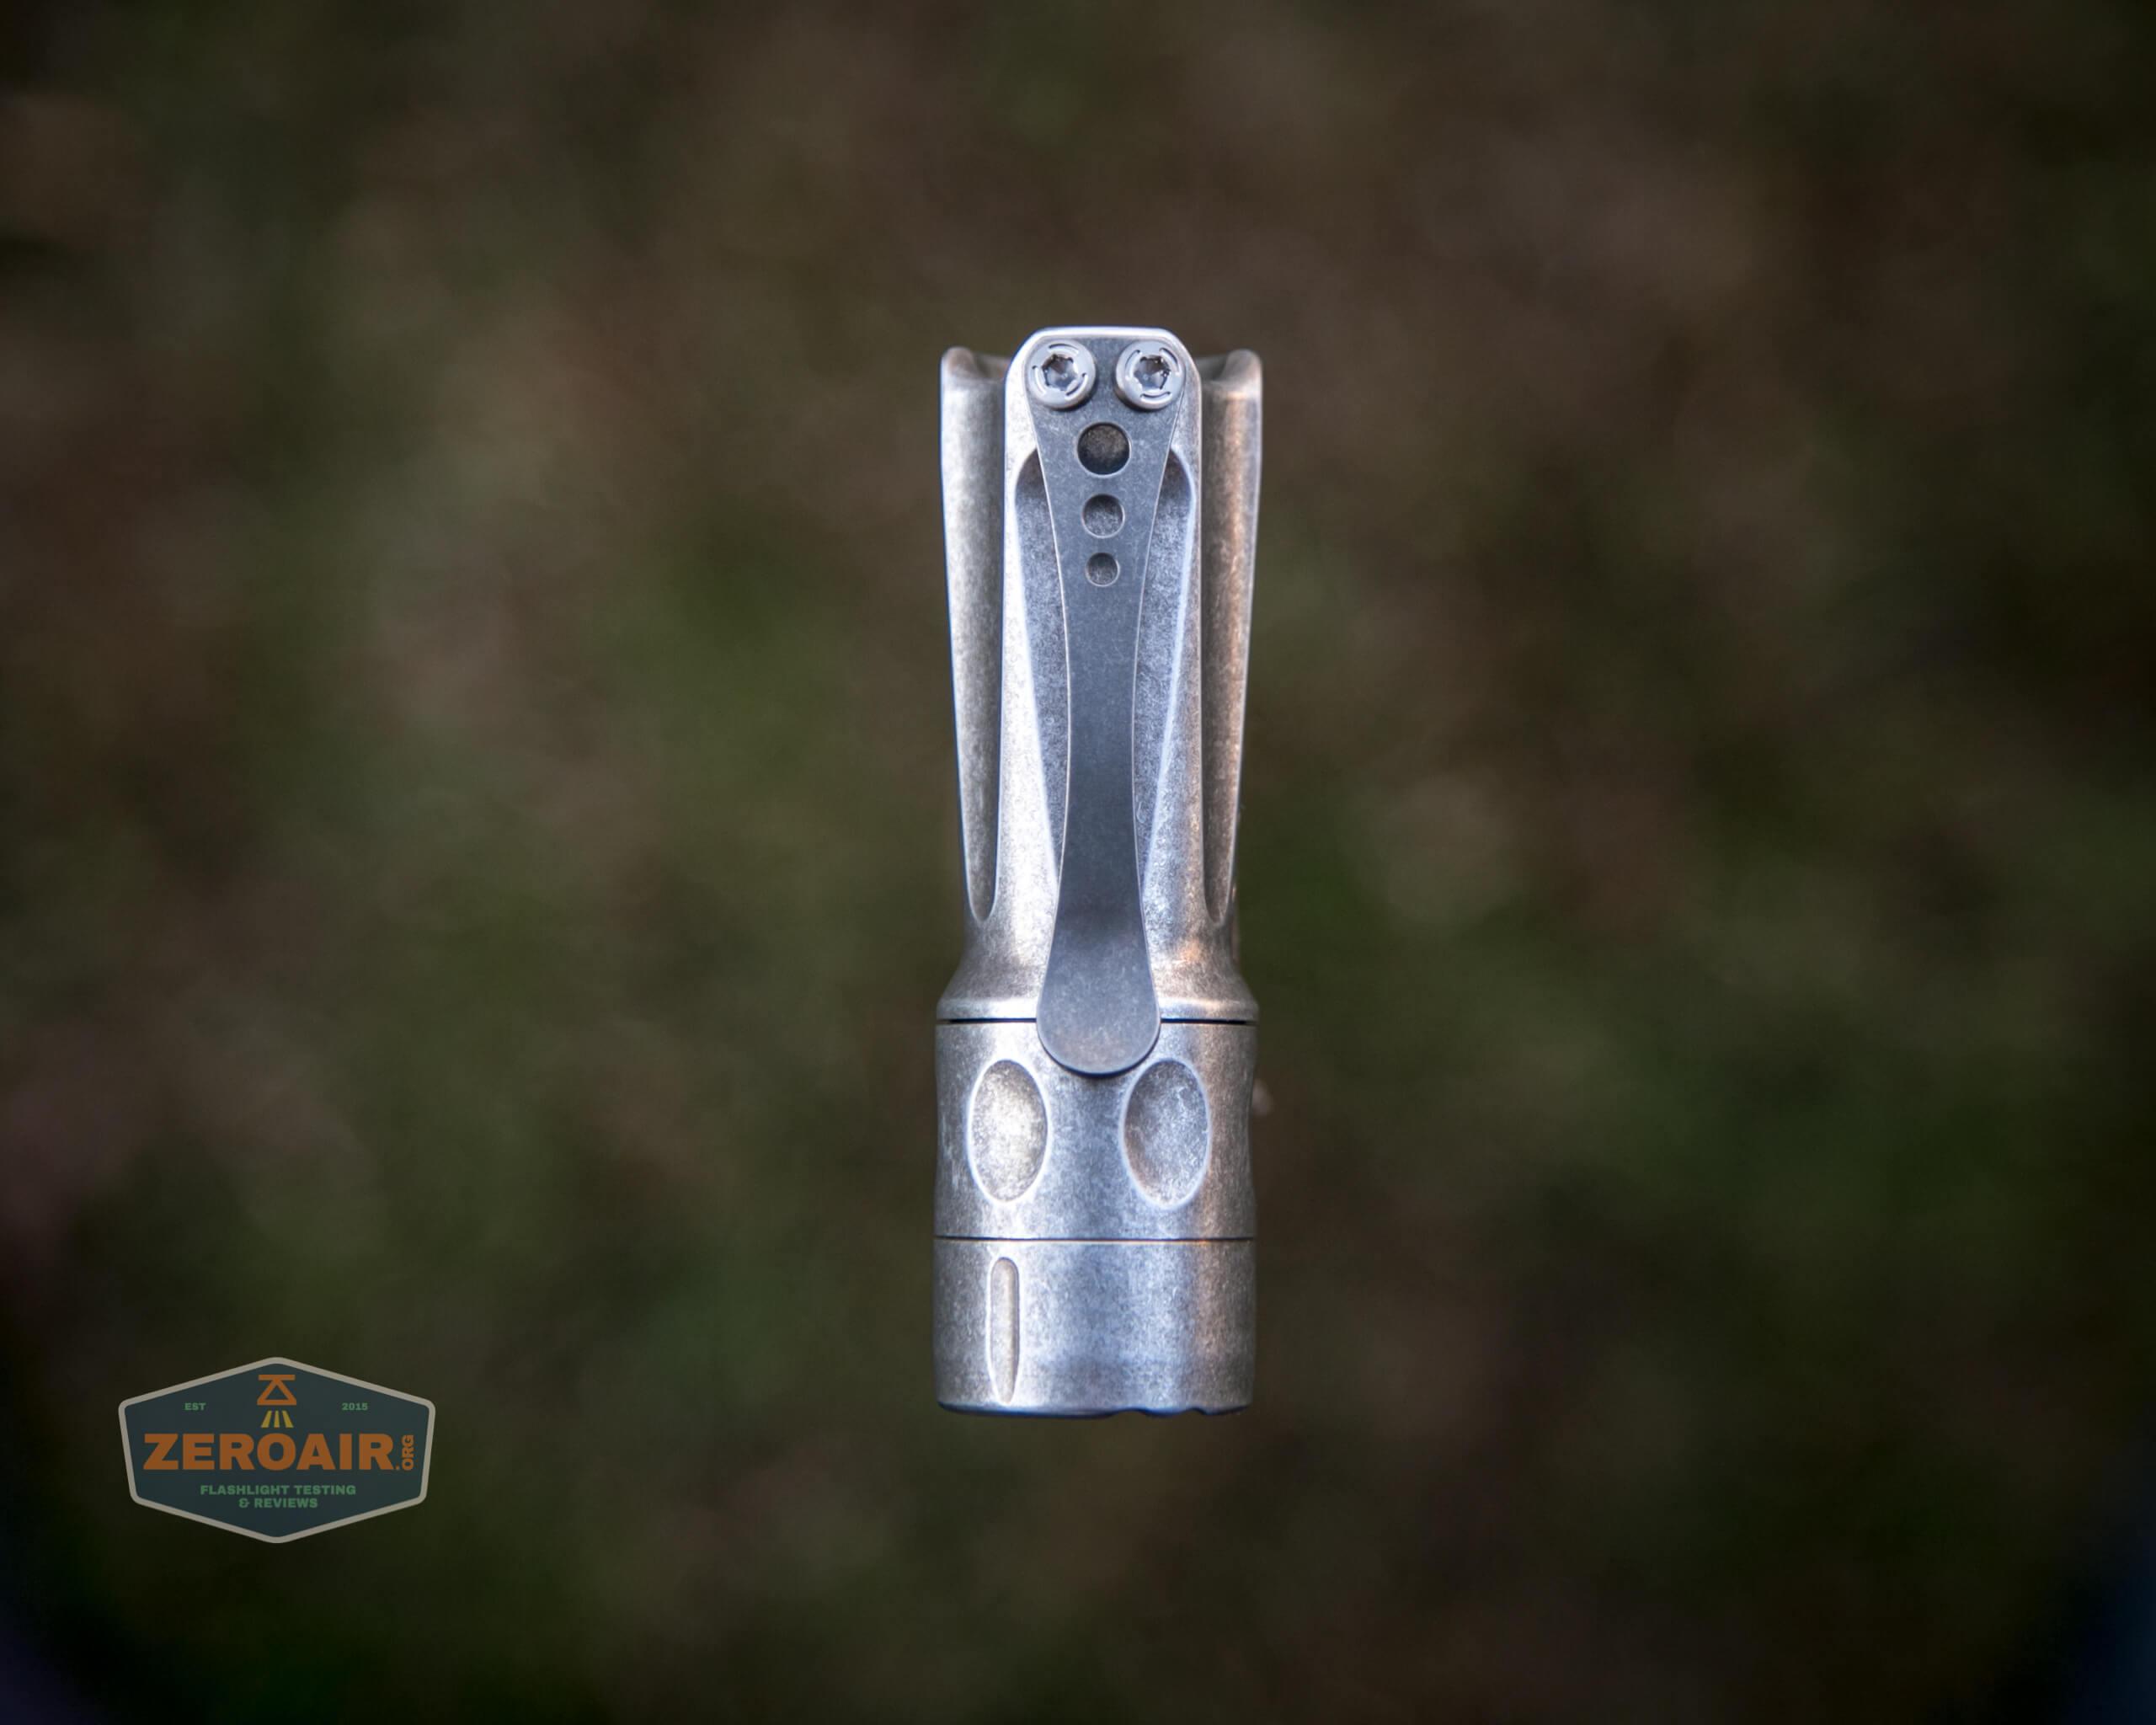 zeroair reviews 2020 top posts torchlab boss ft 35 aluminum